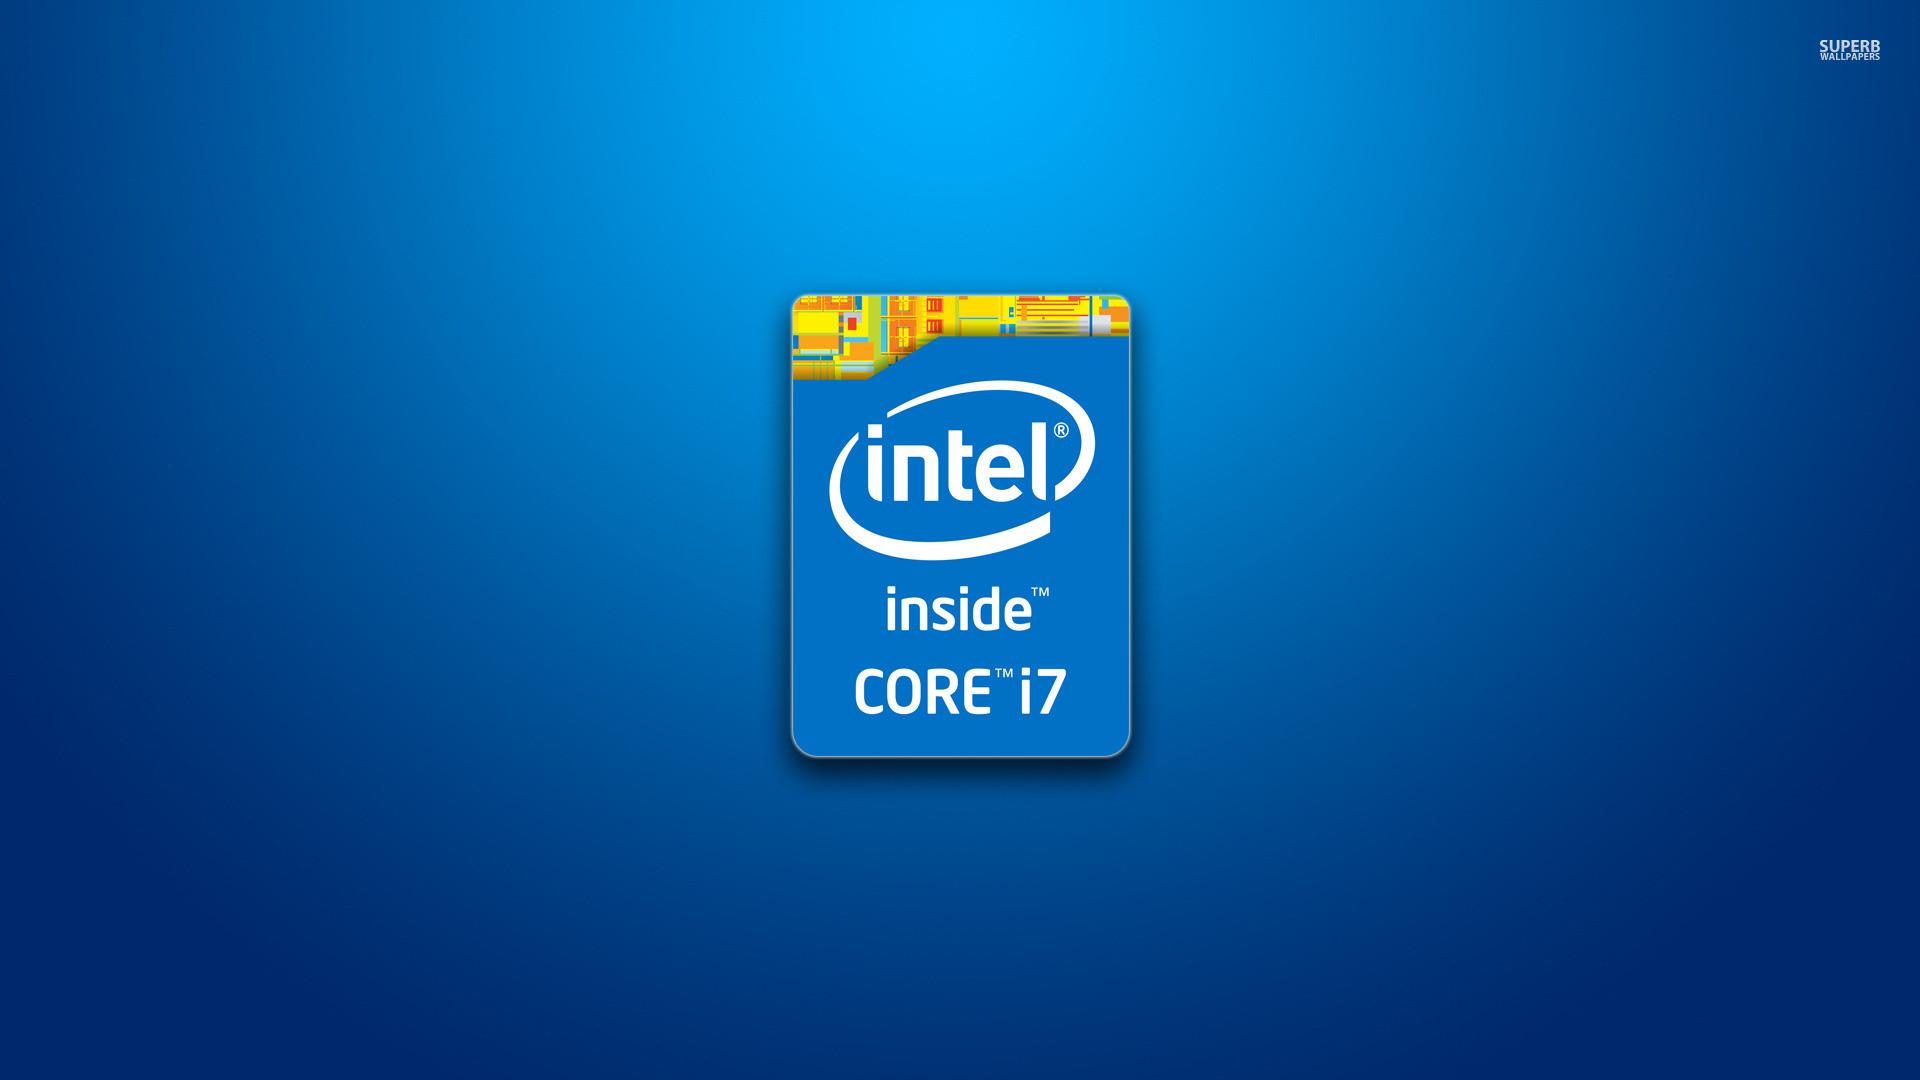 Intel Core i7 Photos 08421 – Baltana